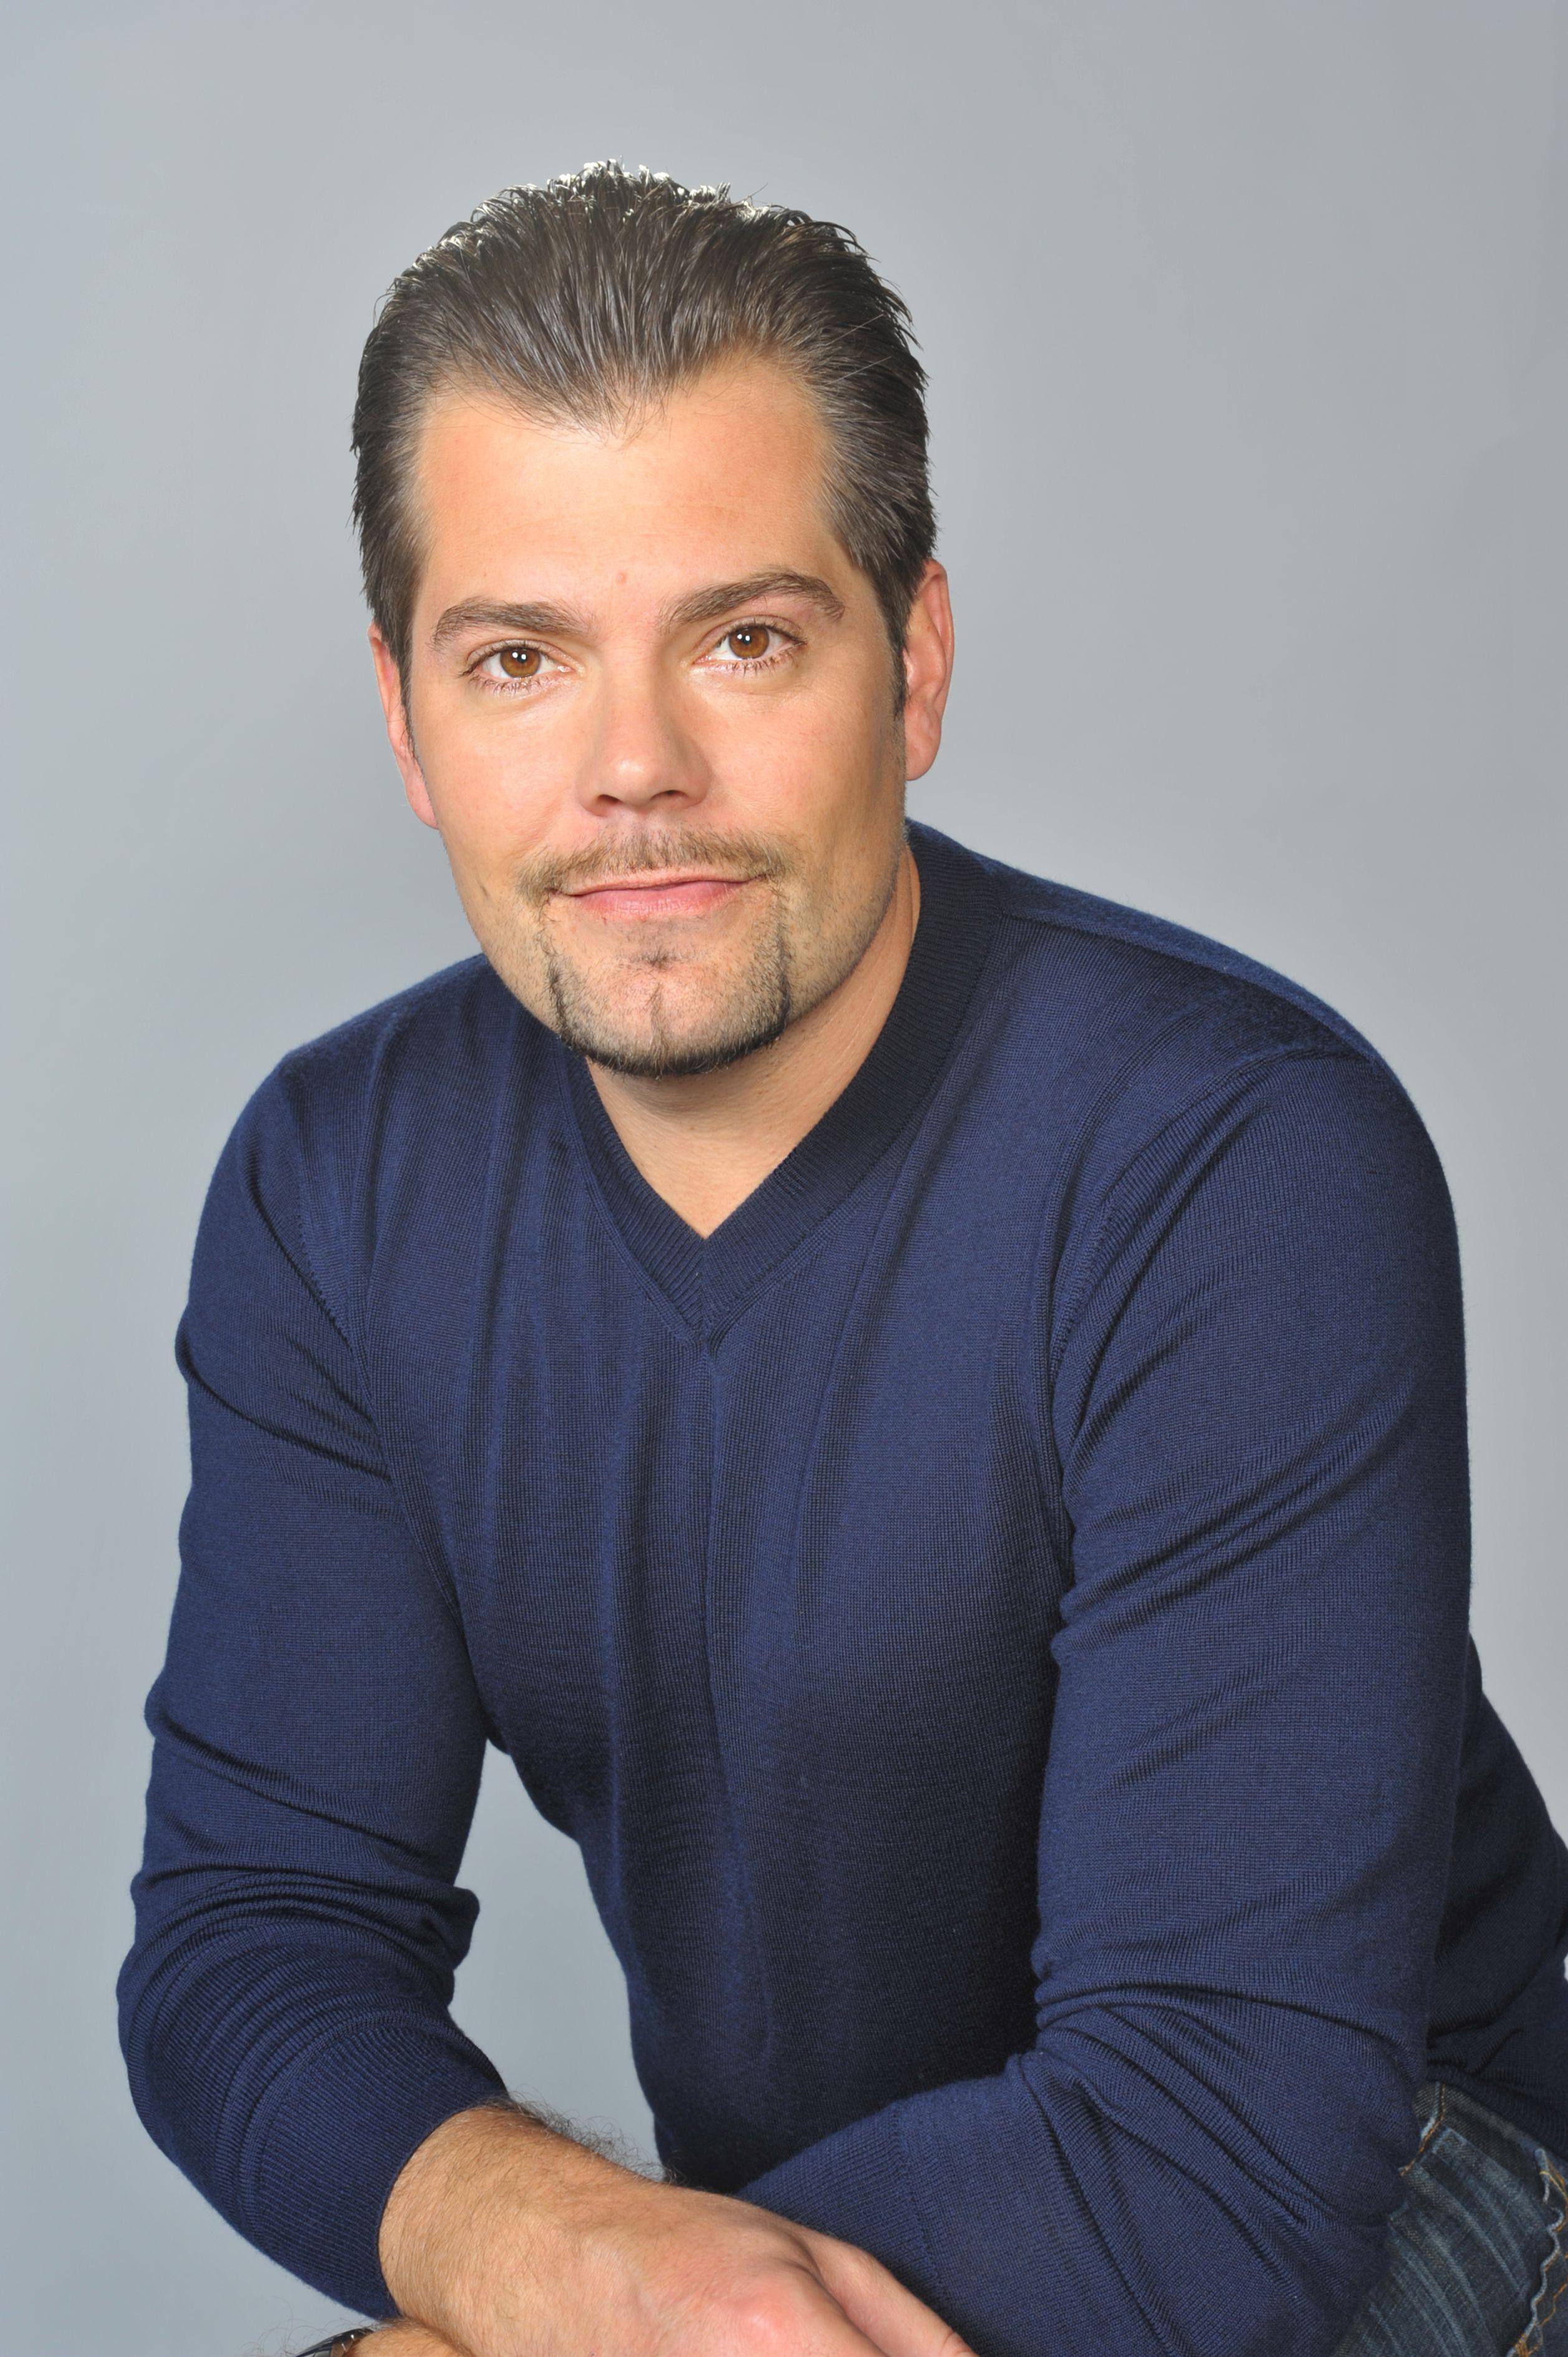 Daniel Fehlow spielt den Leon Moreno